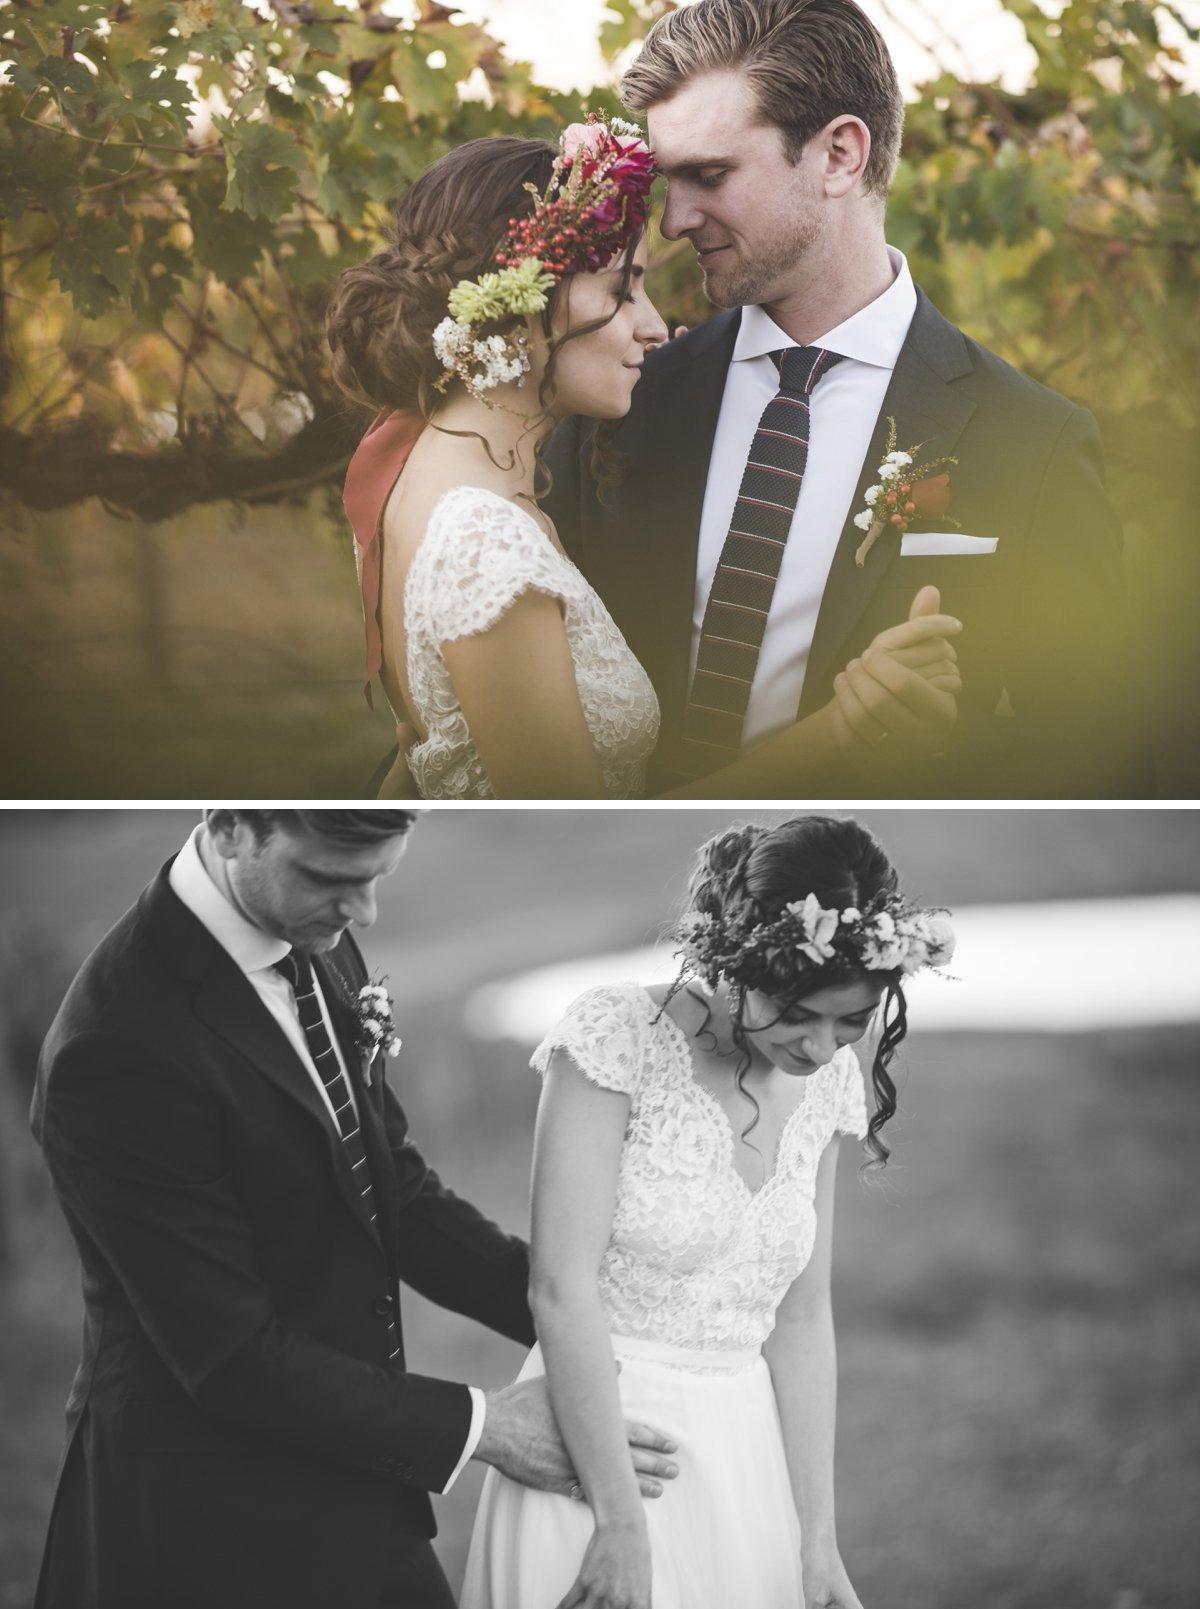 Wagga Wagga Wedding Photographer at Borambola Winery Wagga Wagga Albury wedding photographer Culcairn wedding venue_1139